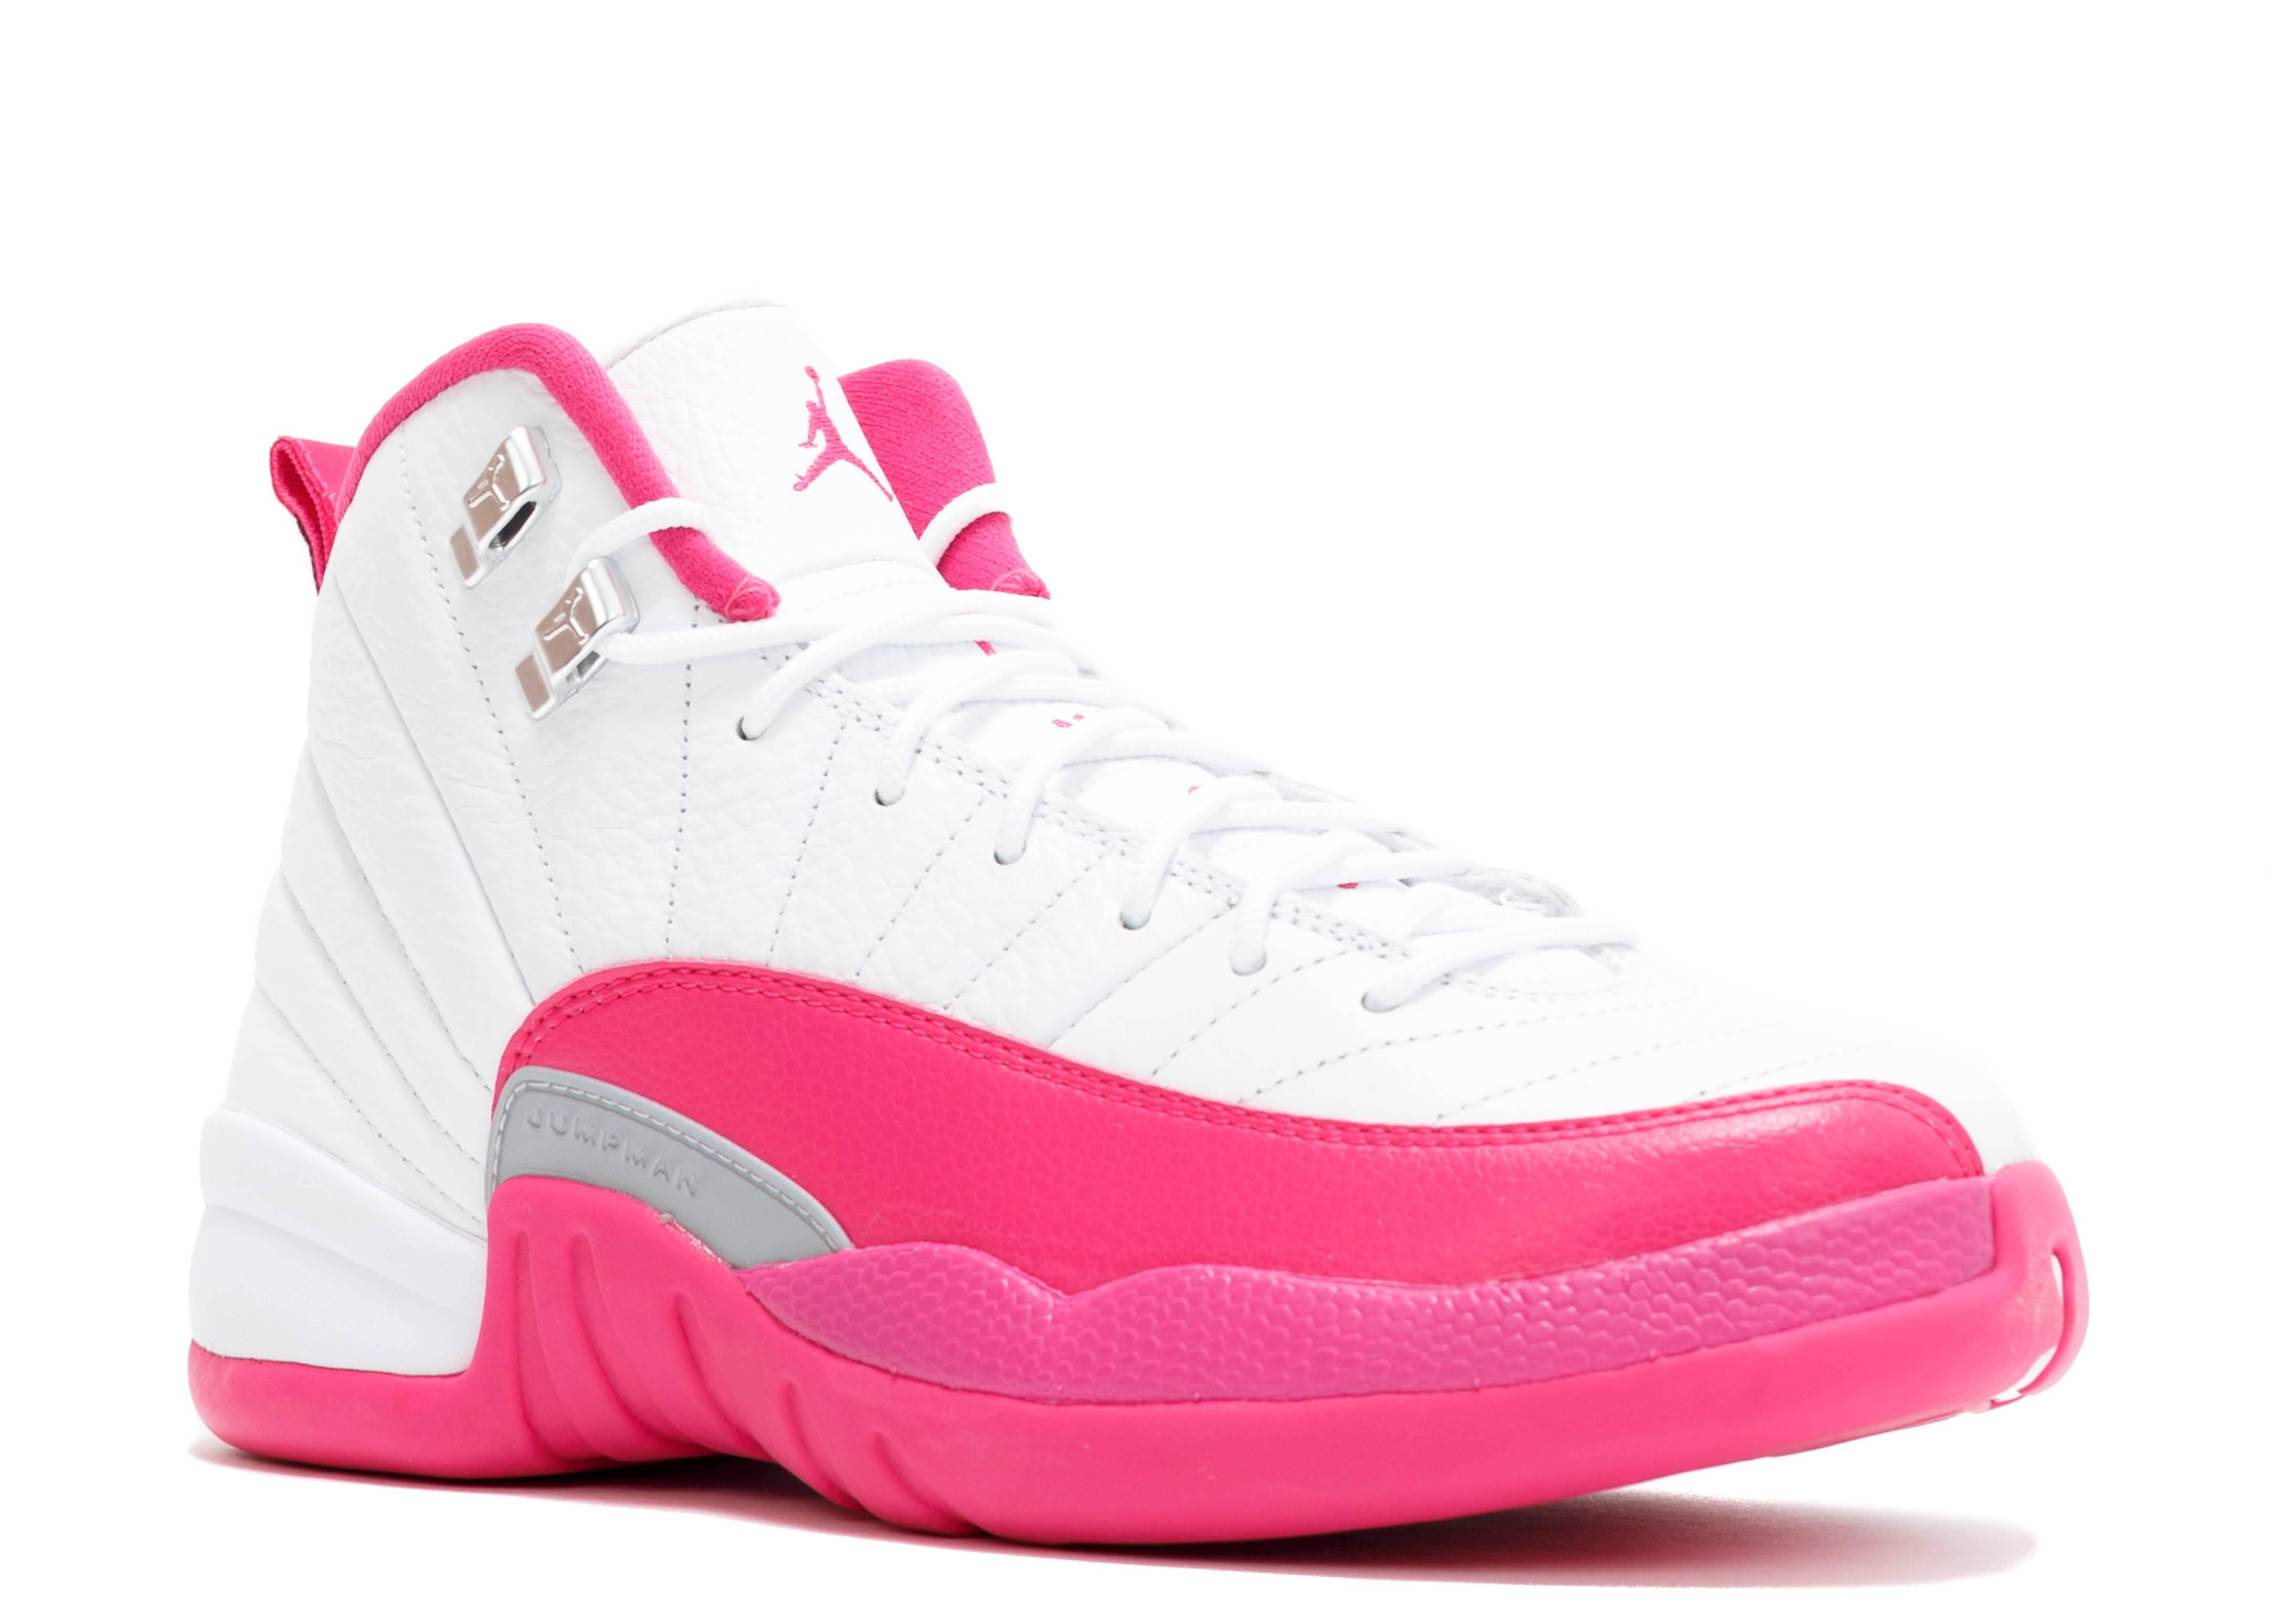 Air Jordan 12 Retro GG 'Vivid Pink'